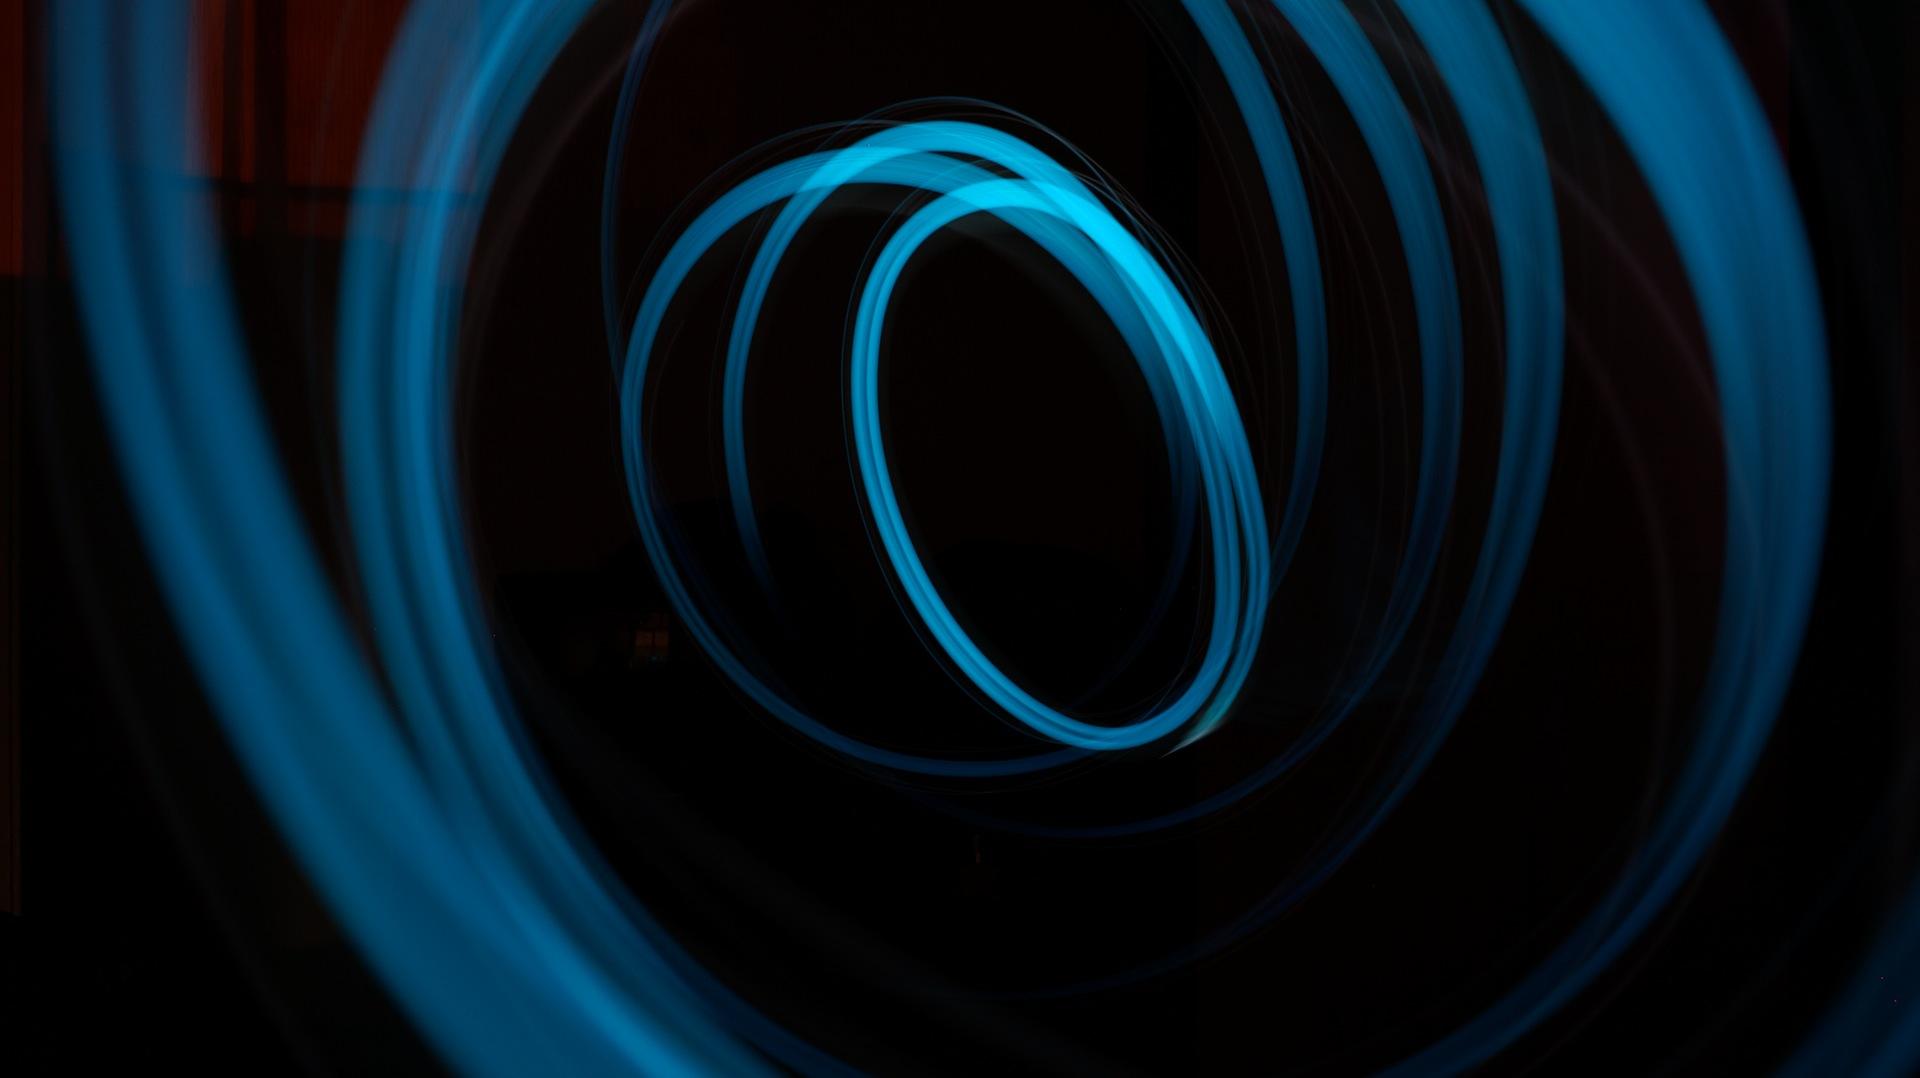 luces, oscuridad, líneas, arte, azul - Fondos de Pantalla HD - professor-falken.com